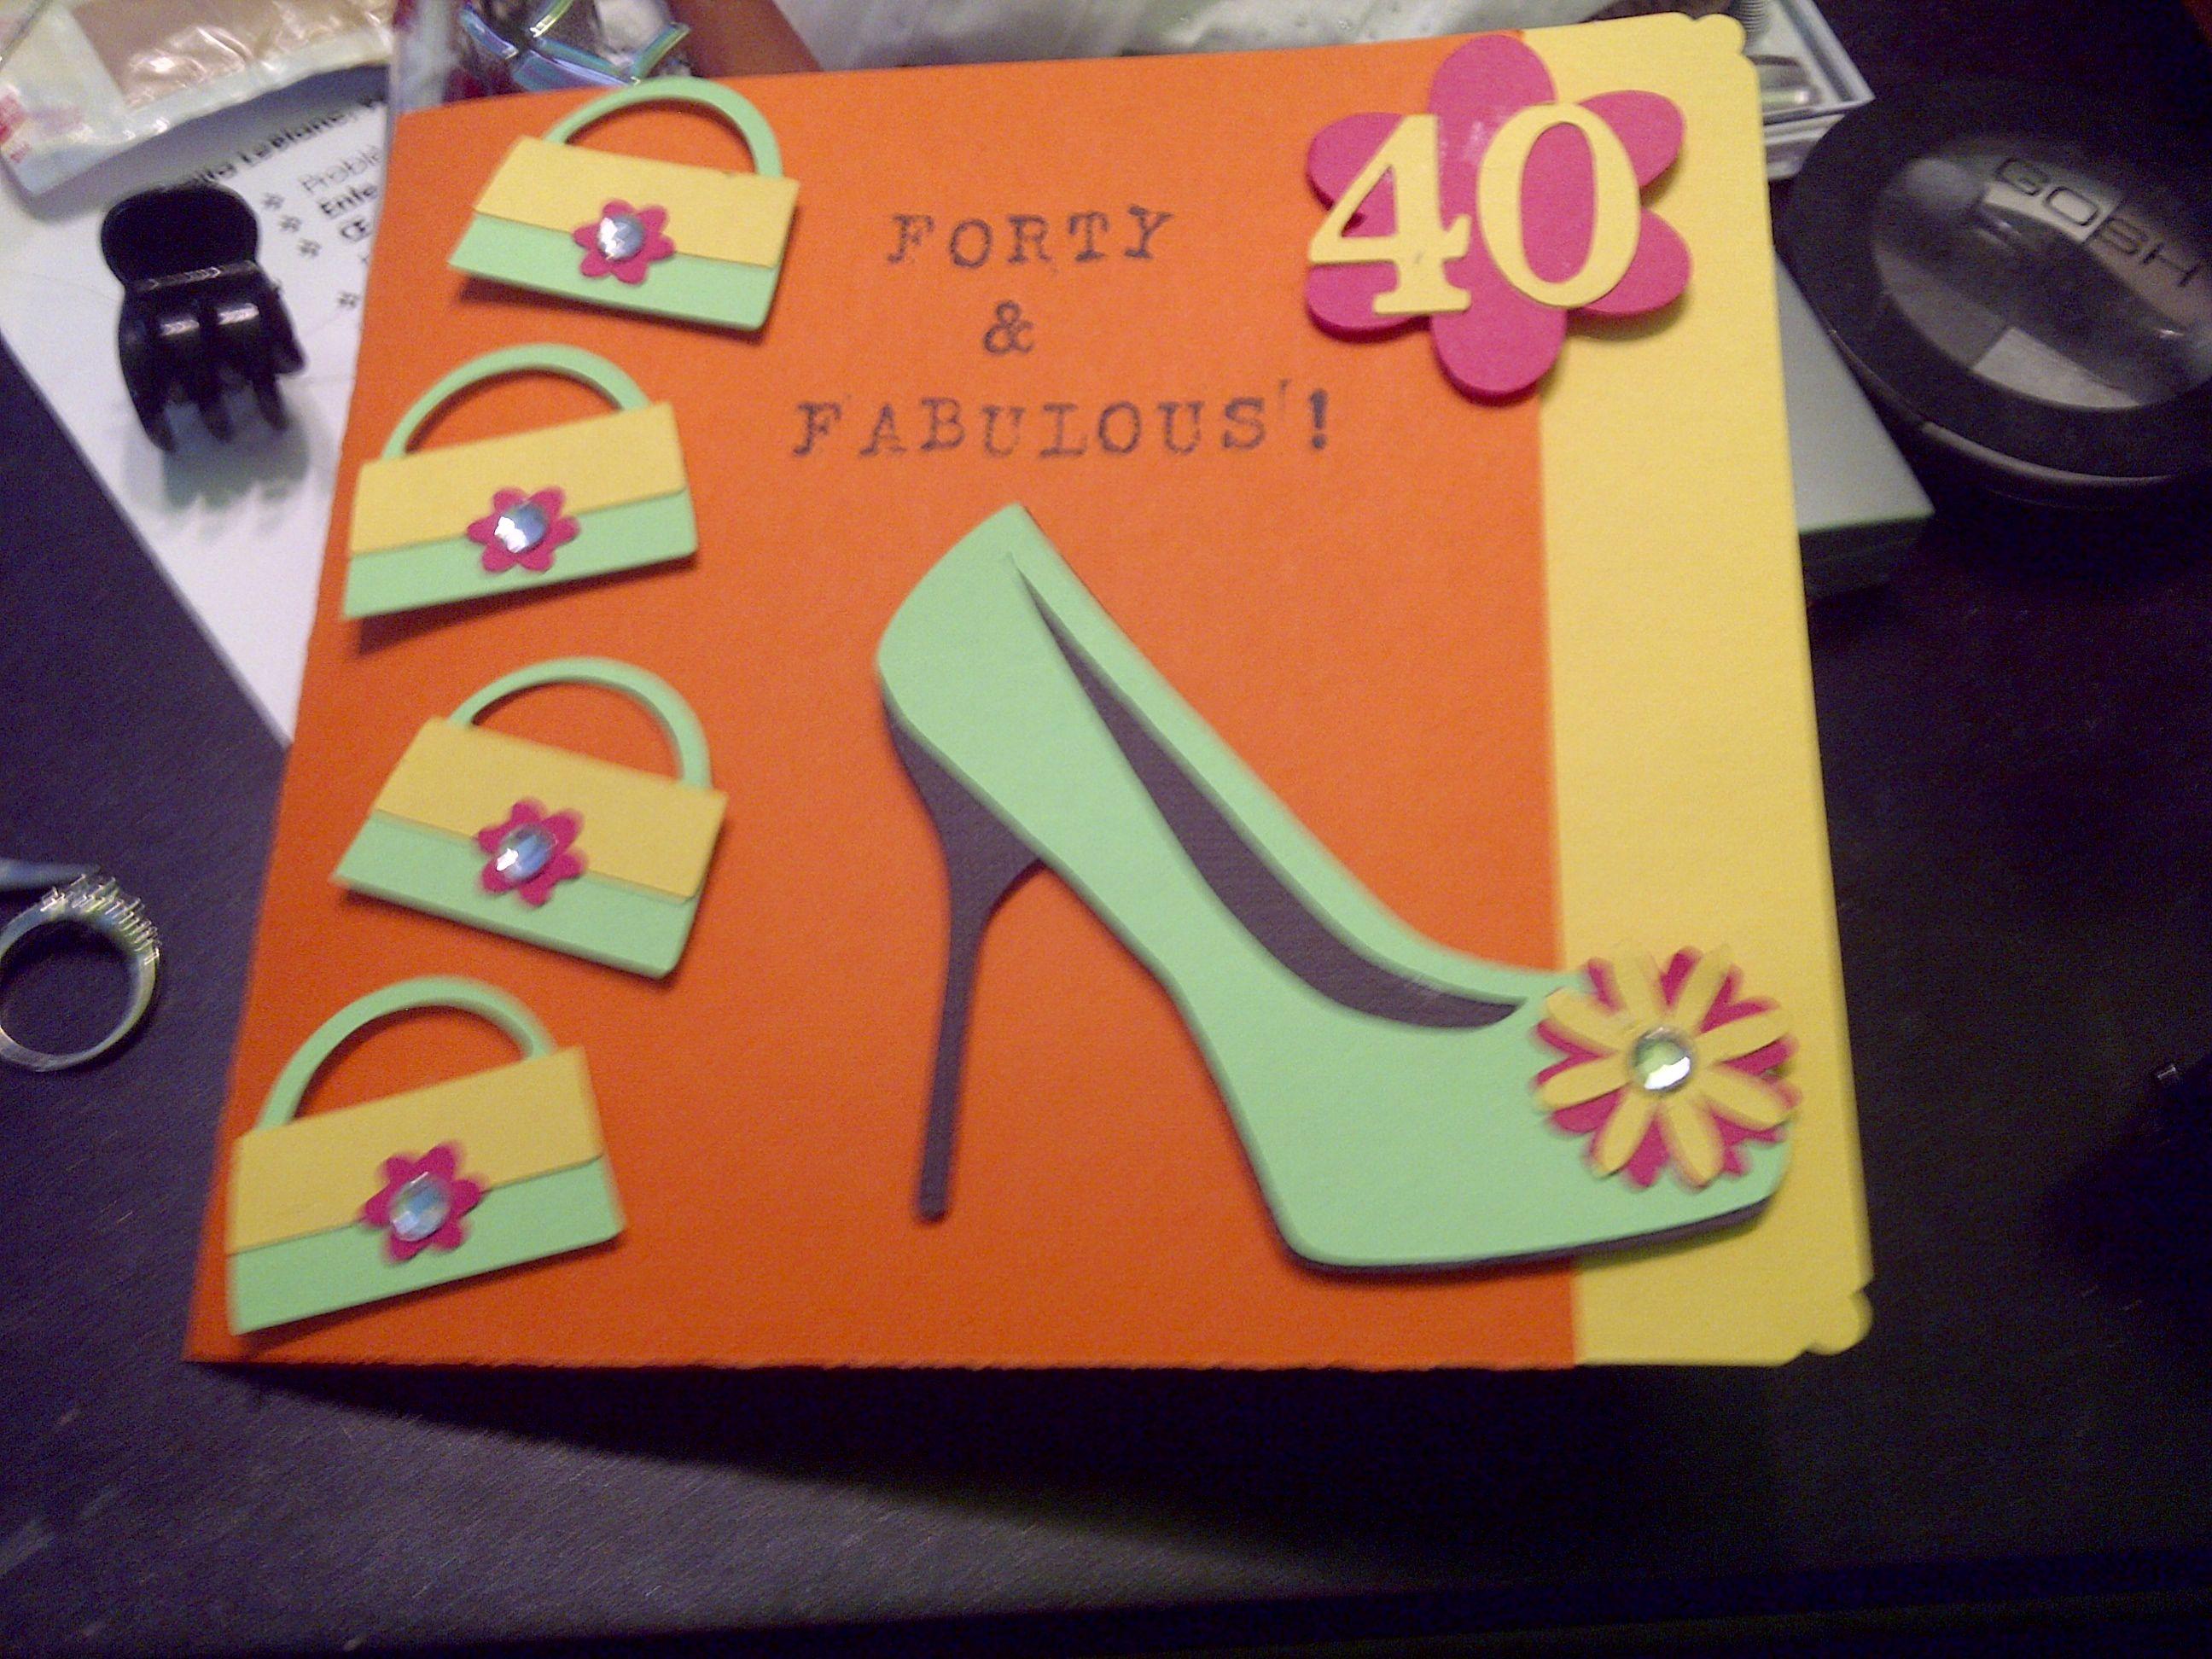 40th Birthday Card Cricut Machine Cricut Birthday Cards Cricut